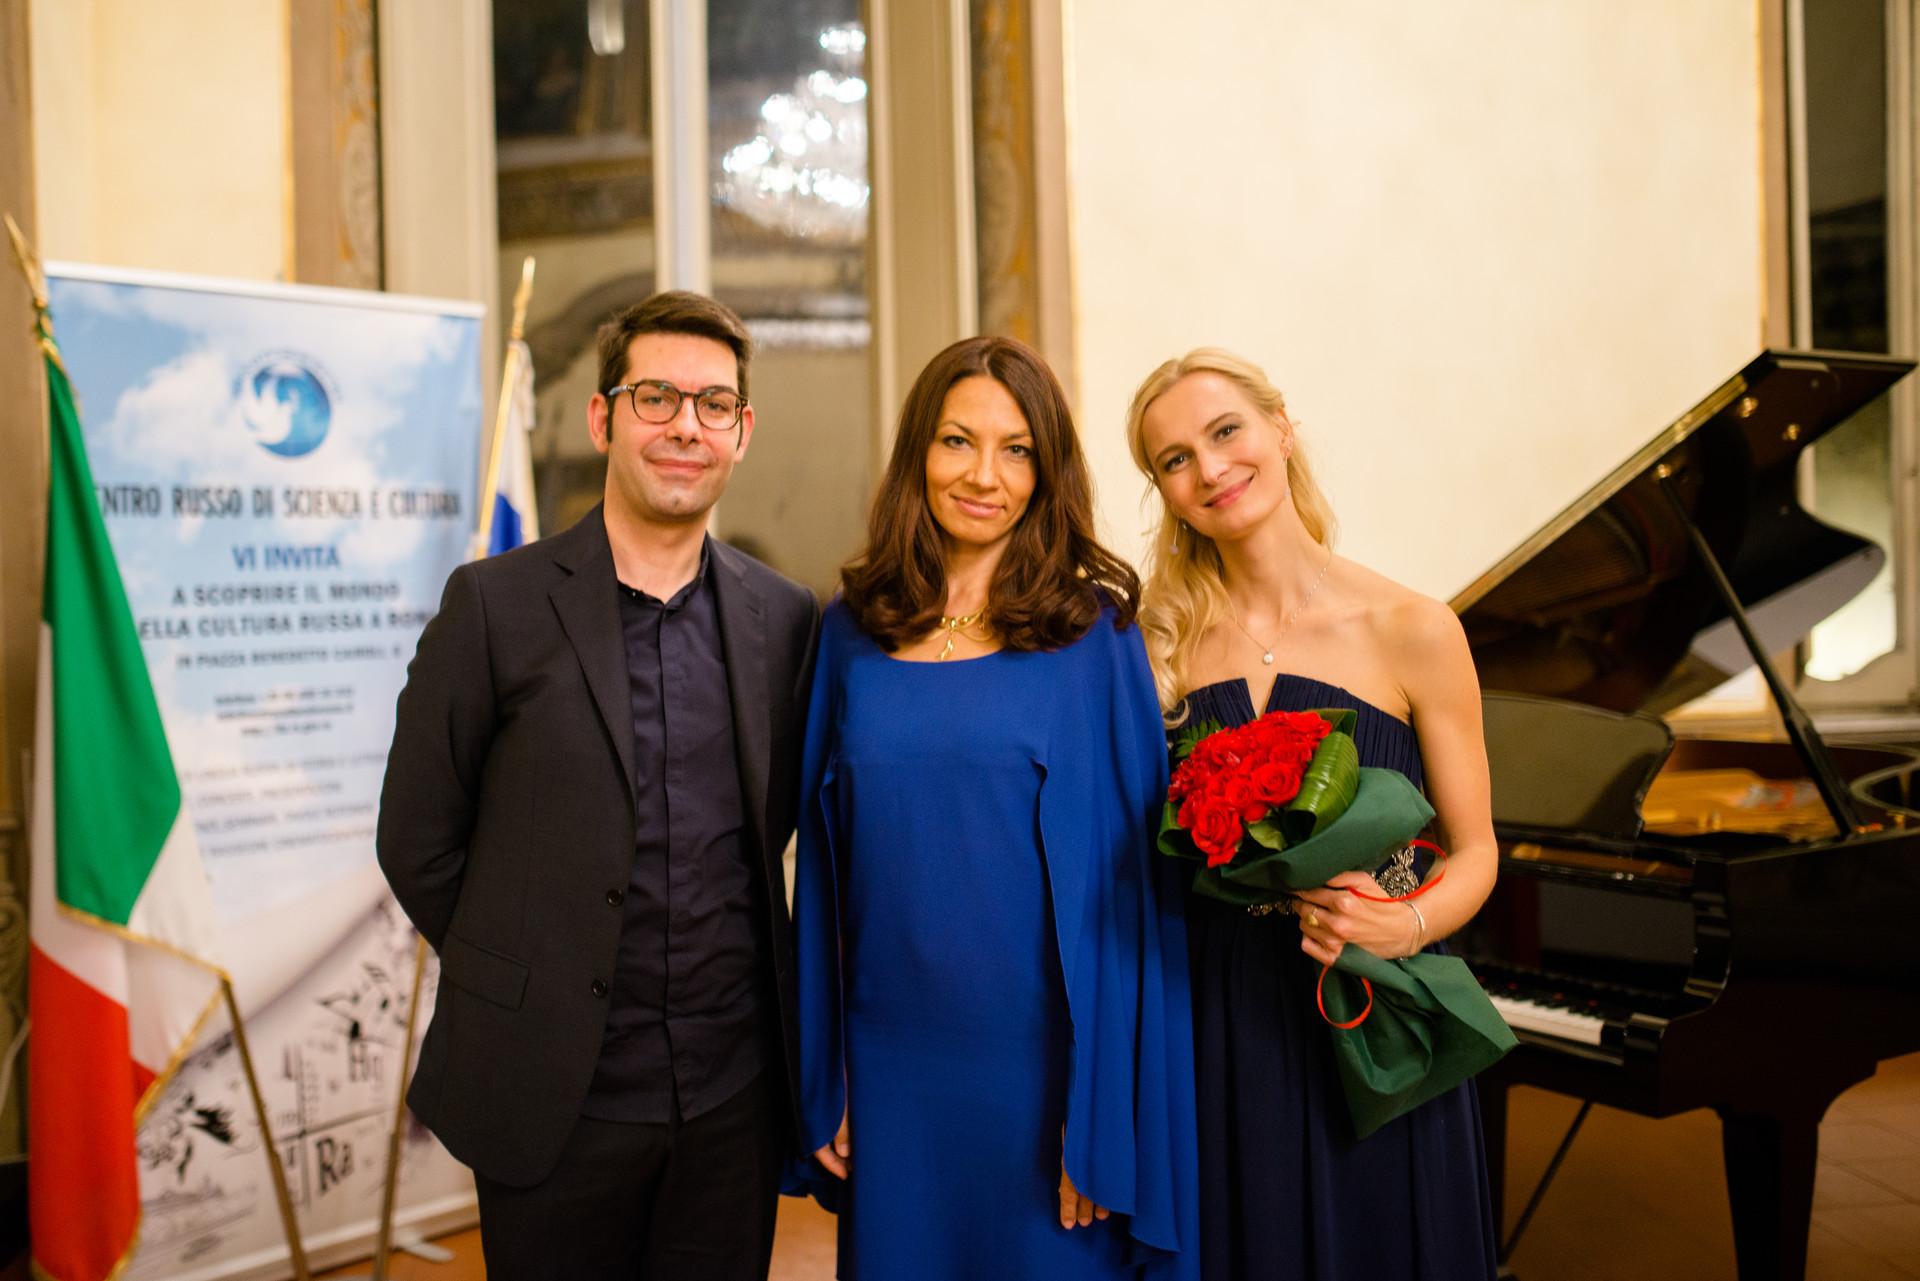 Da sinistra: Giuseppe Rossi (pianoforte), Daria Pushkova e Elena Tsarenko (mezzosoprano)